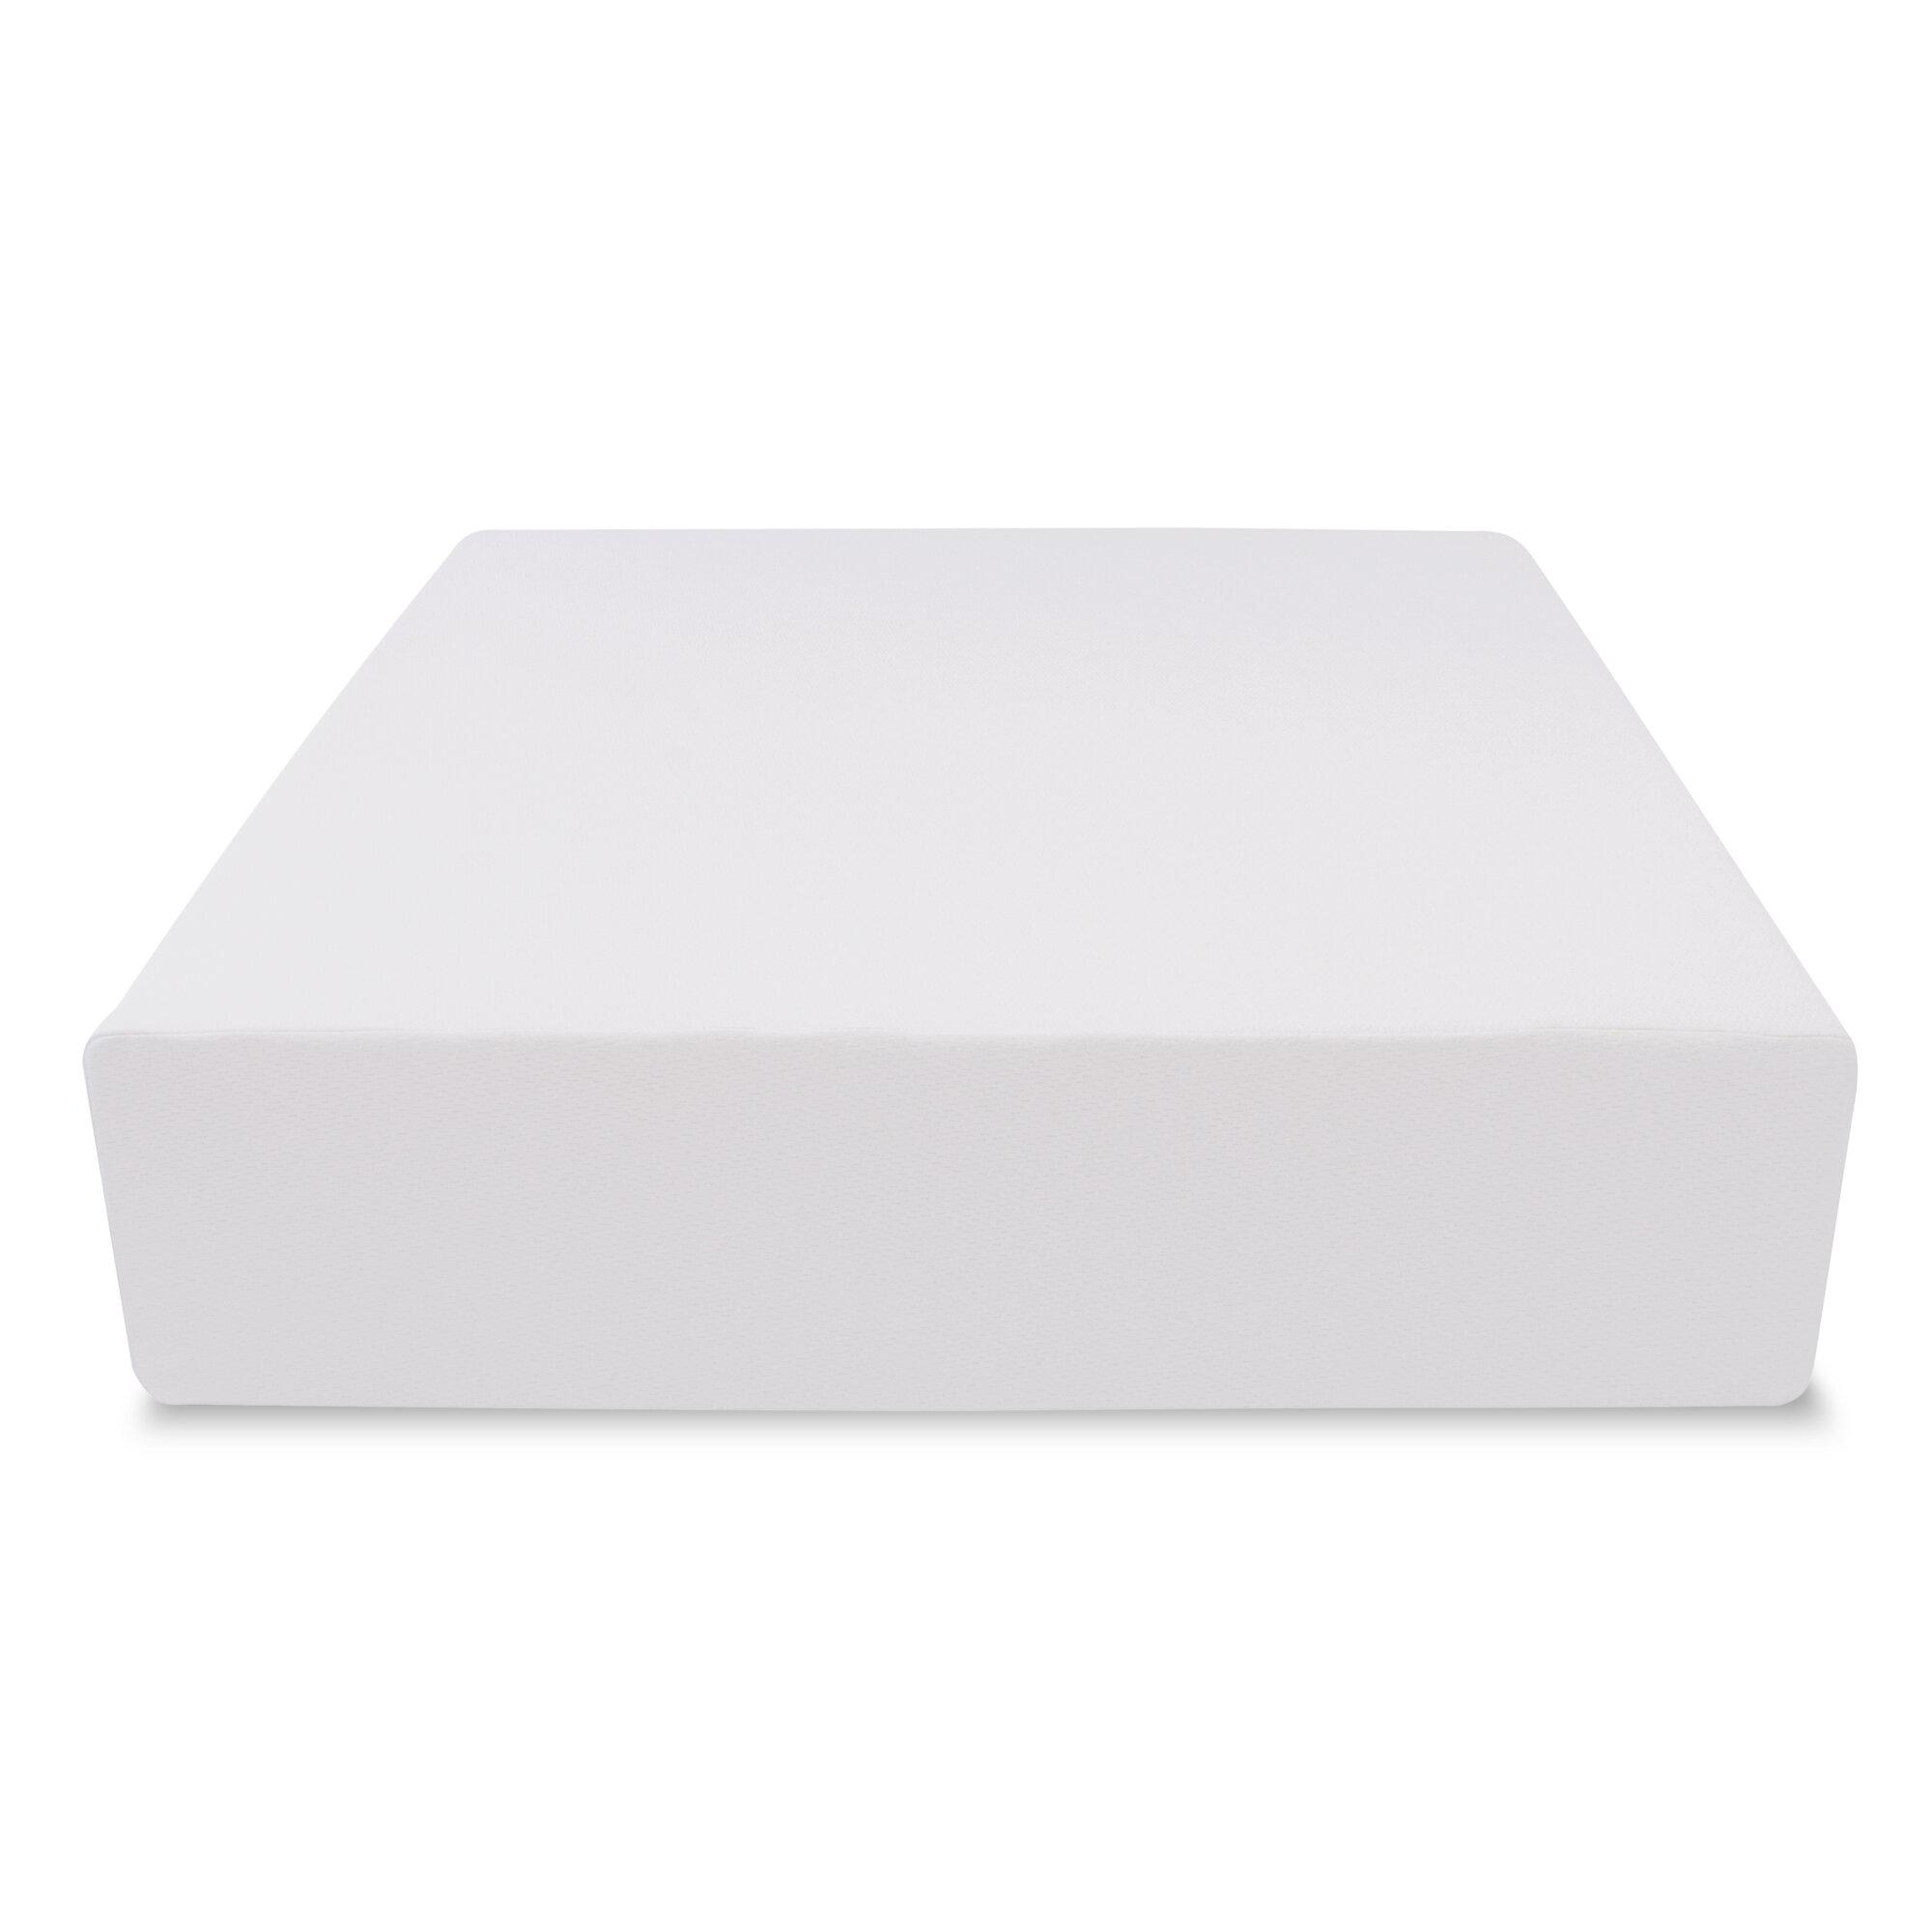 Serenia Sleep 14 Medium Firm Gel Memory Foam Mattress Ebay